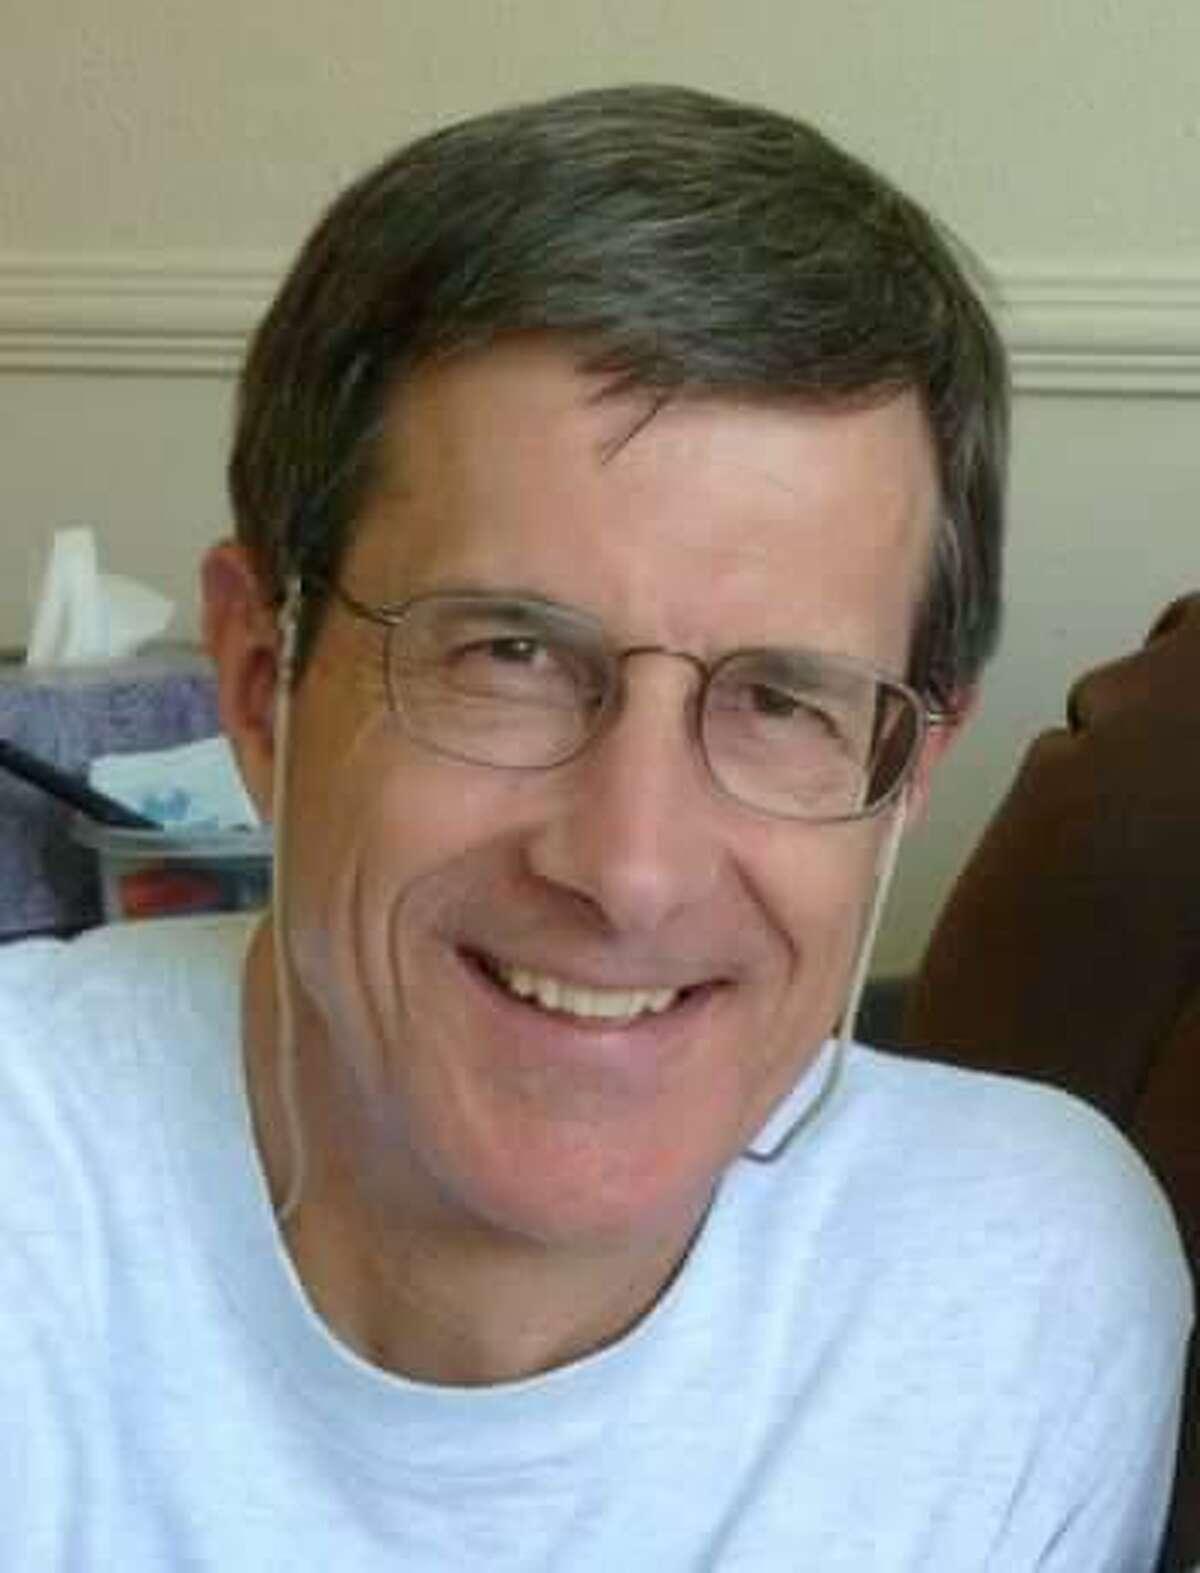 Retiree Michael Osborn, 69, is seeking the District 1 seat on the North East ISD board of trustees.